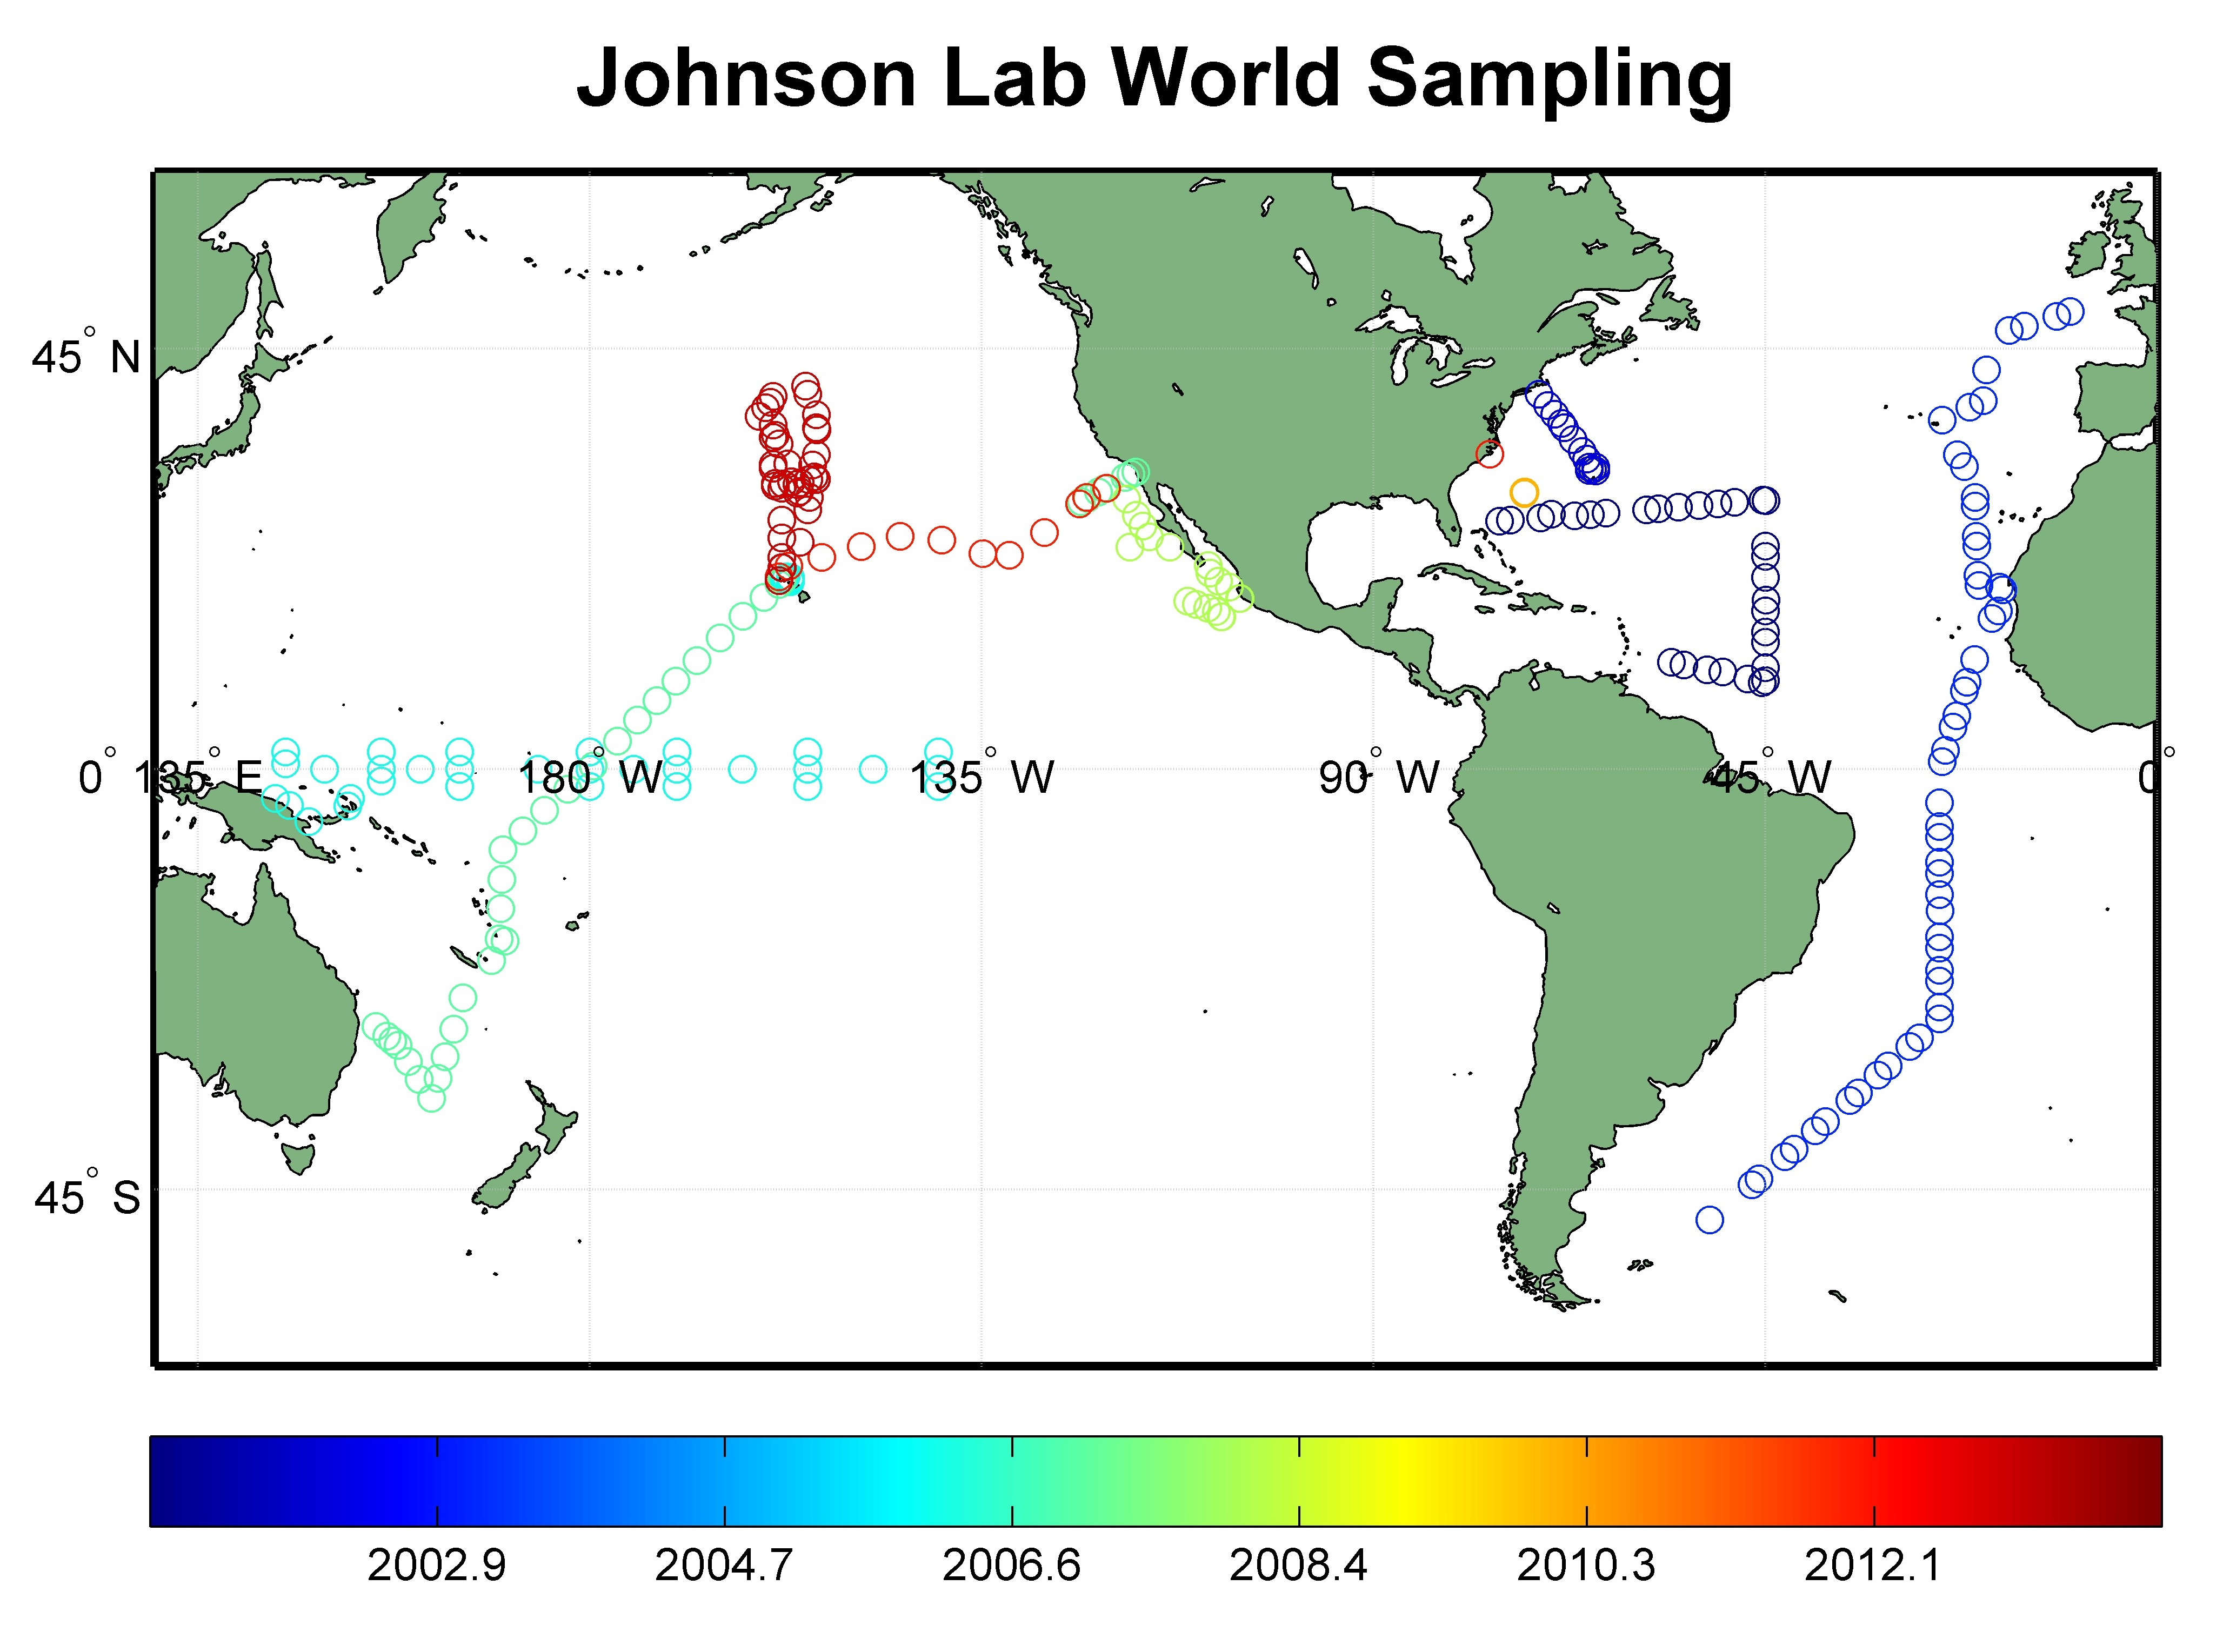 worldsampling